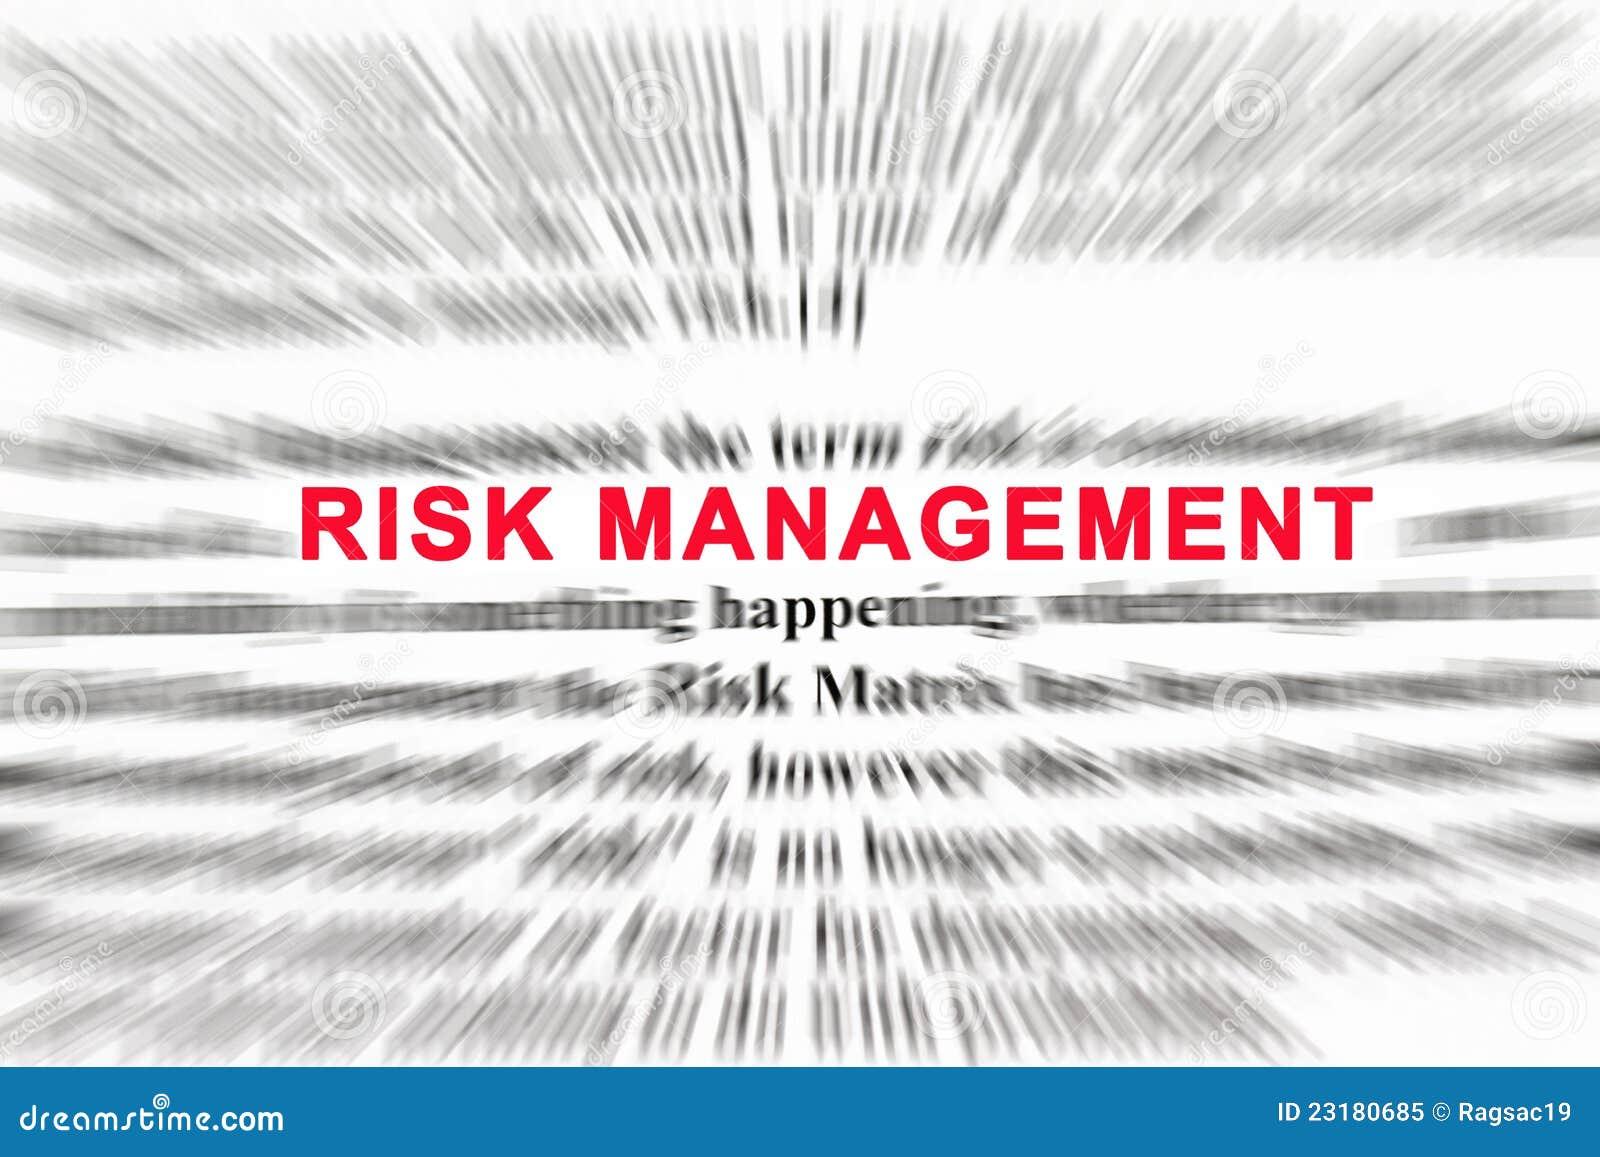 Risk Management and Insurance craigslist free animals